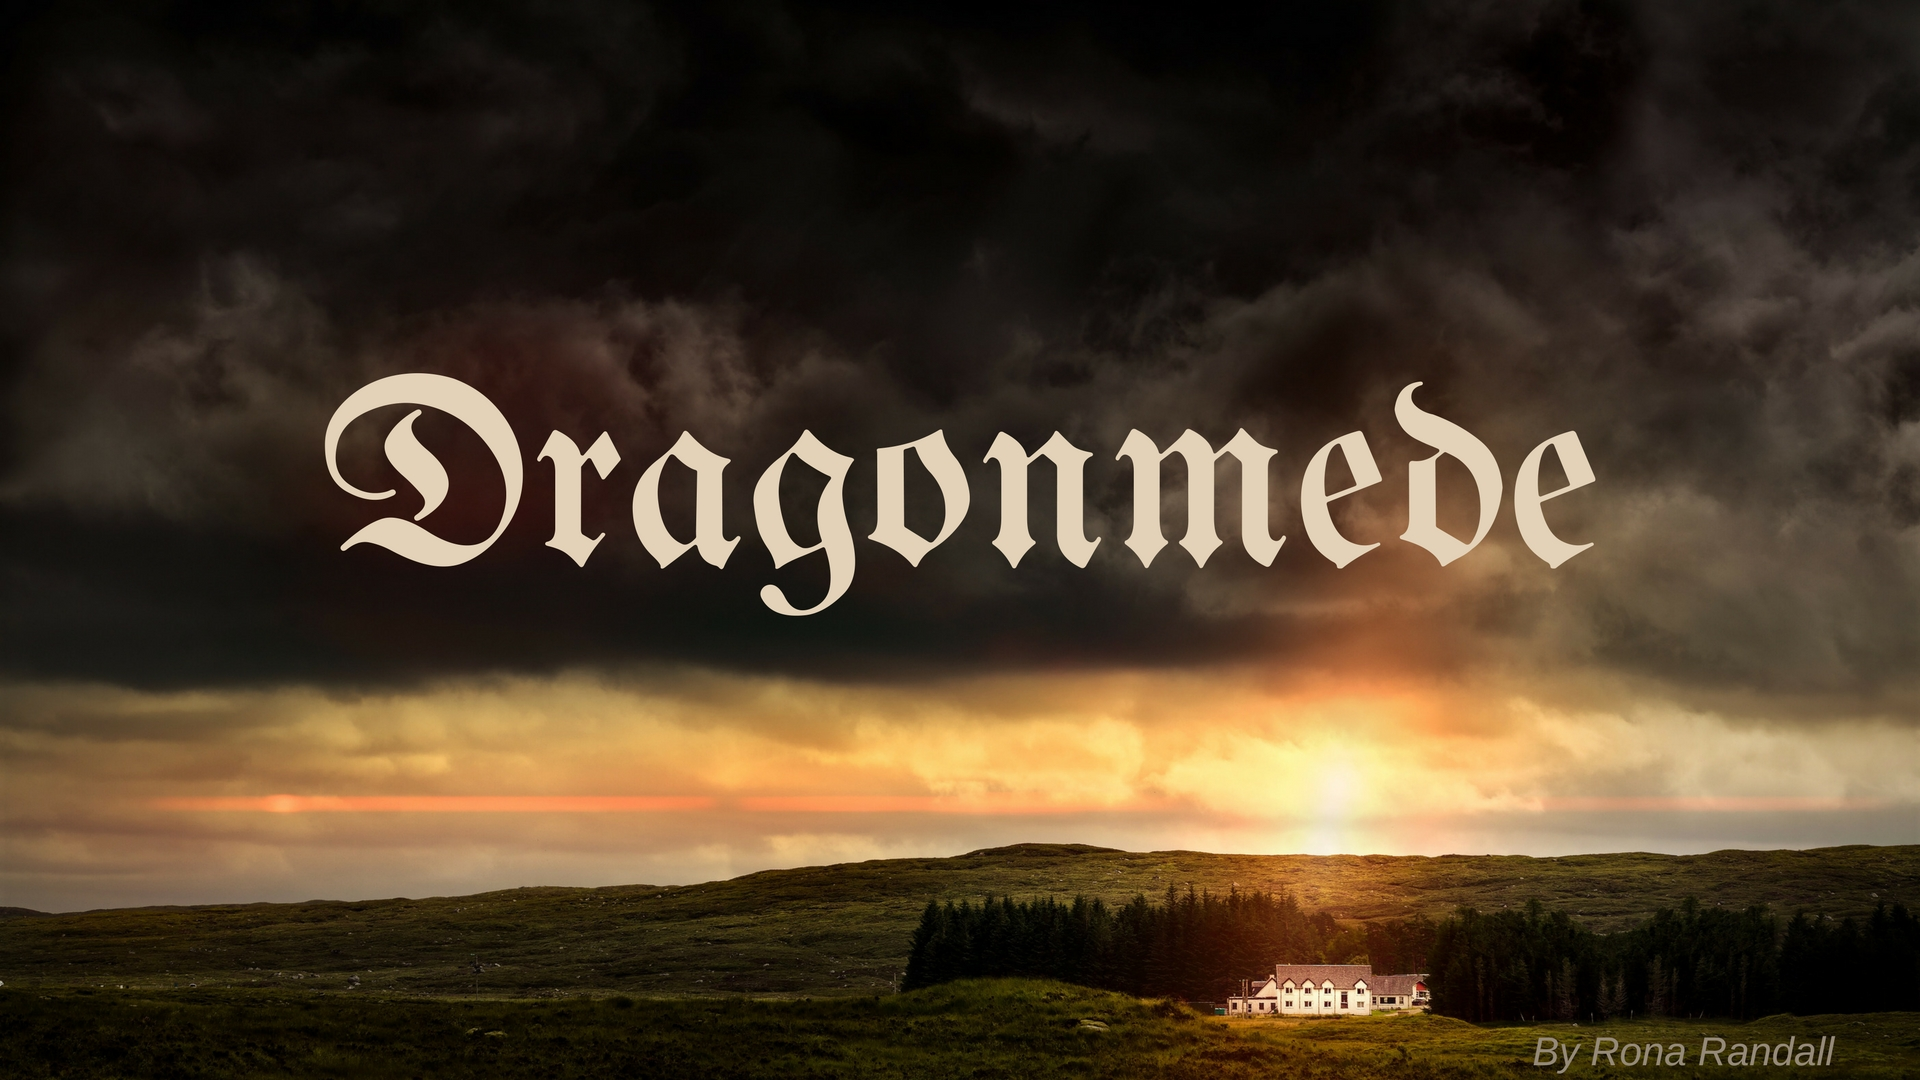 Dragonmede.jpg